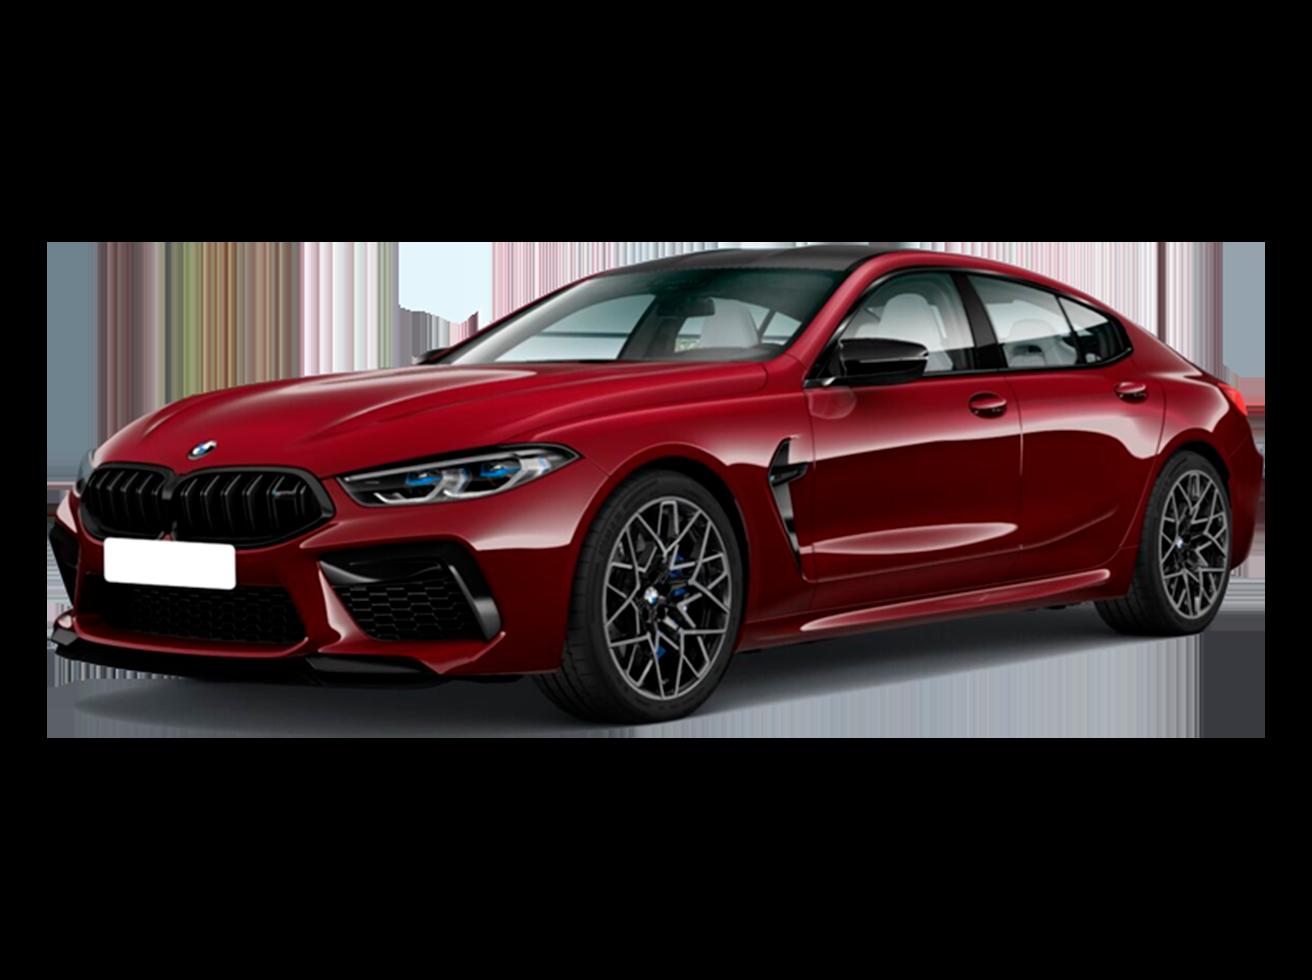 BMW - M8 - 4.4 V8 TWINPOWER GASOLINA XDRIVE GRAN COUPÉ STEPTRONIC